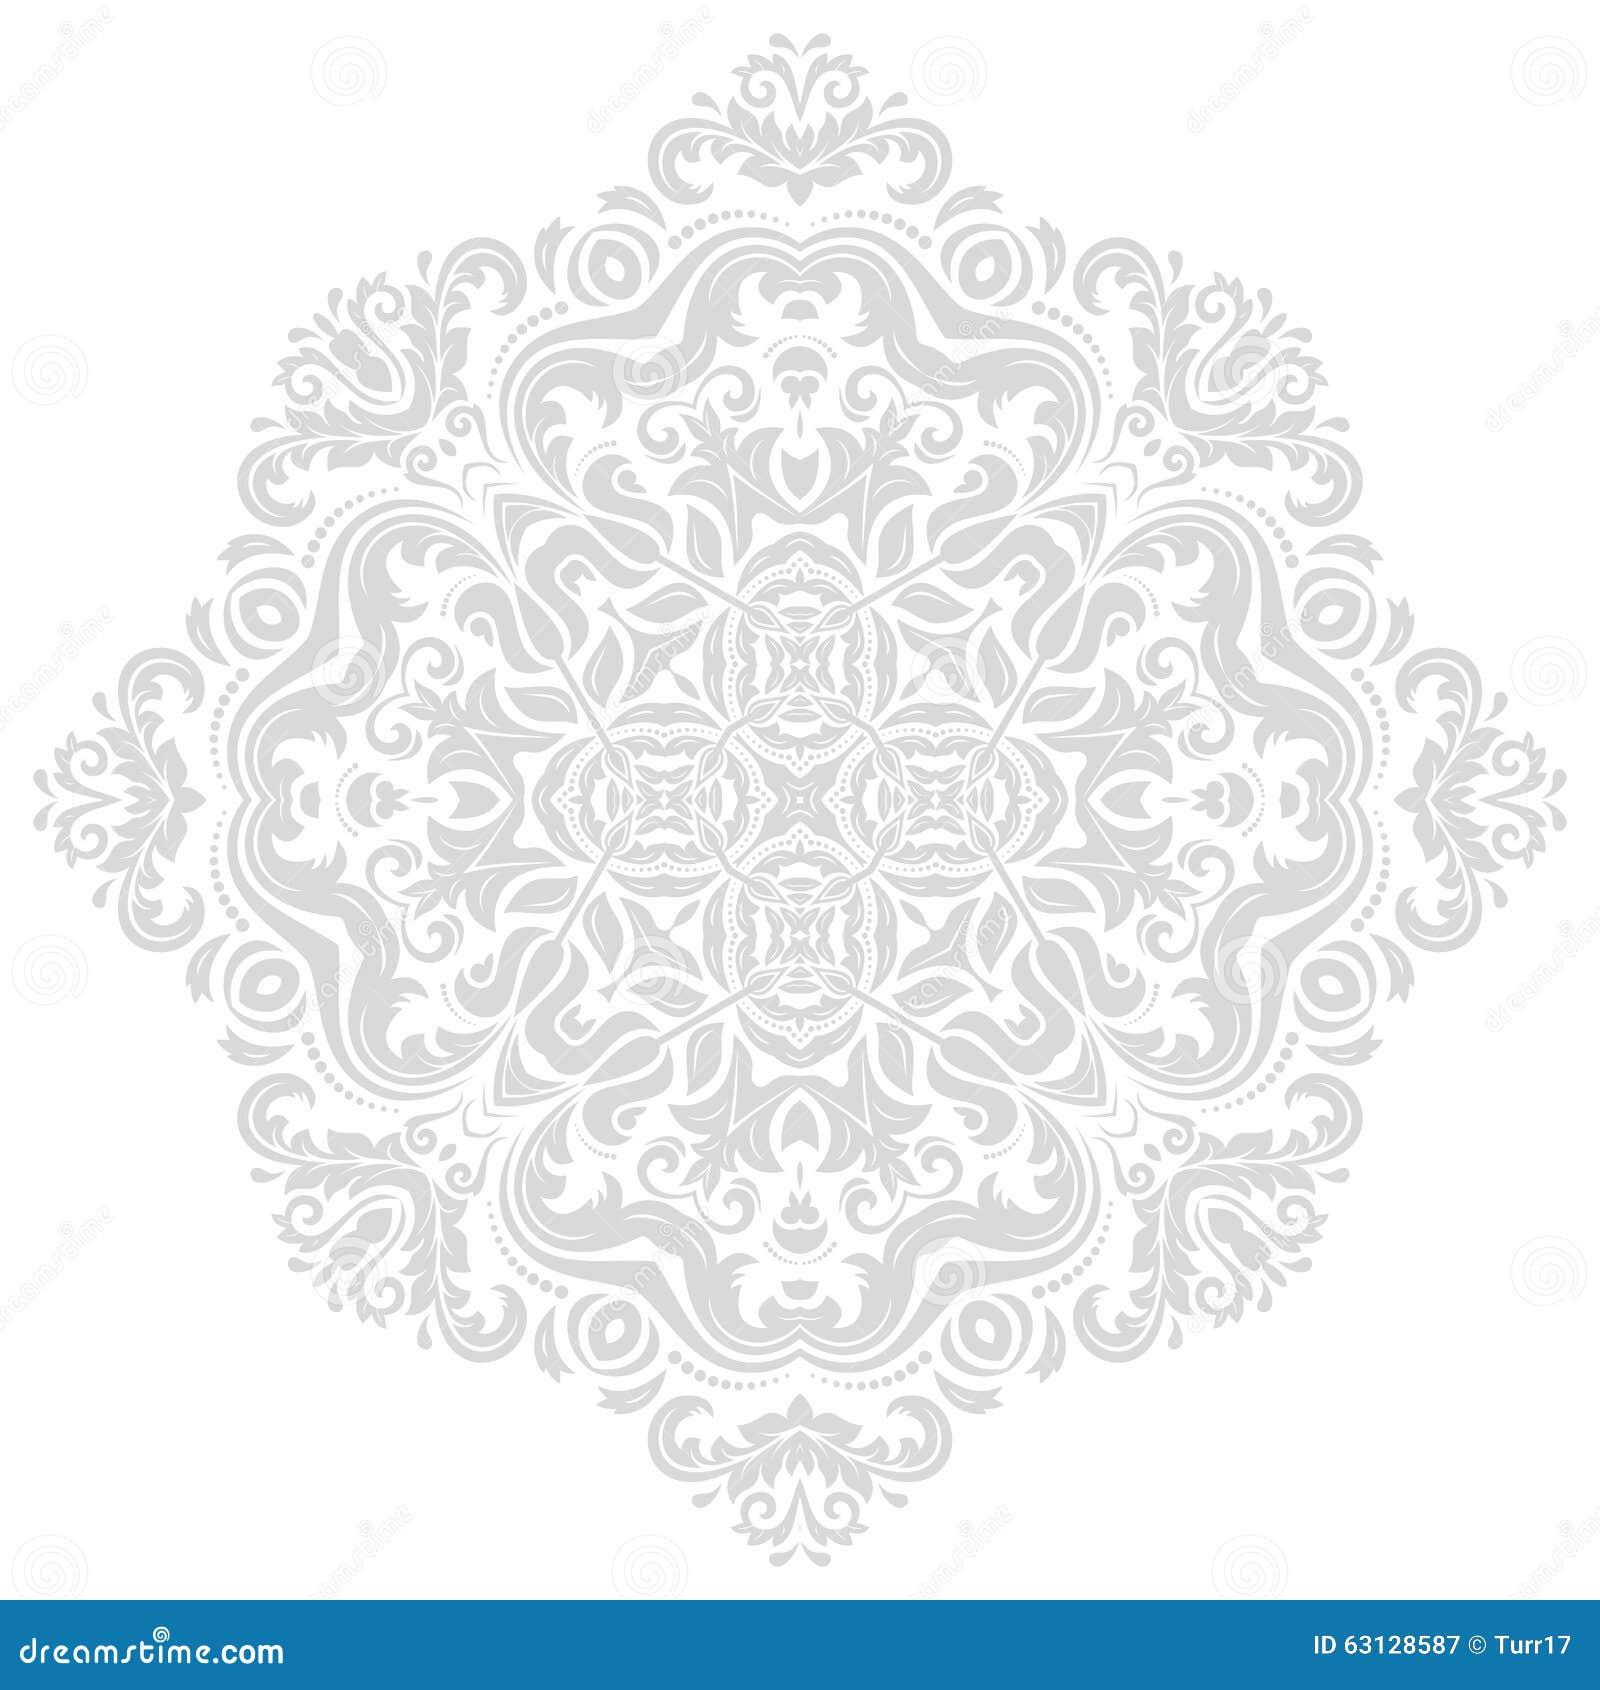 orientalisches abstraktes vektor muster vektor abbildung bild 63128587. Black Bedroom Furniture Sets. Home Design Ideas